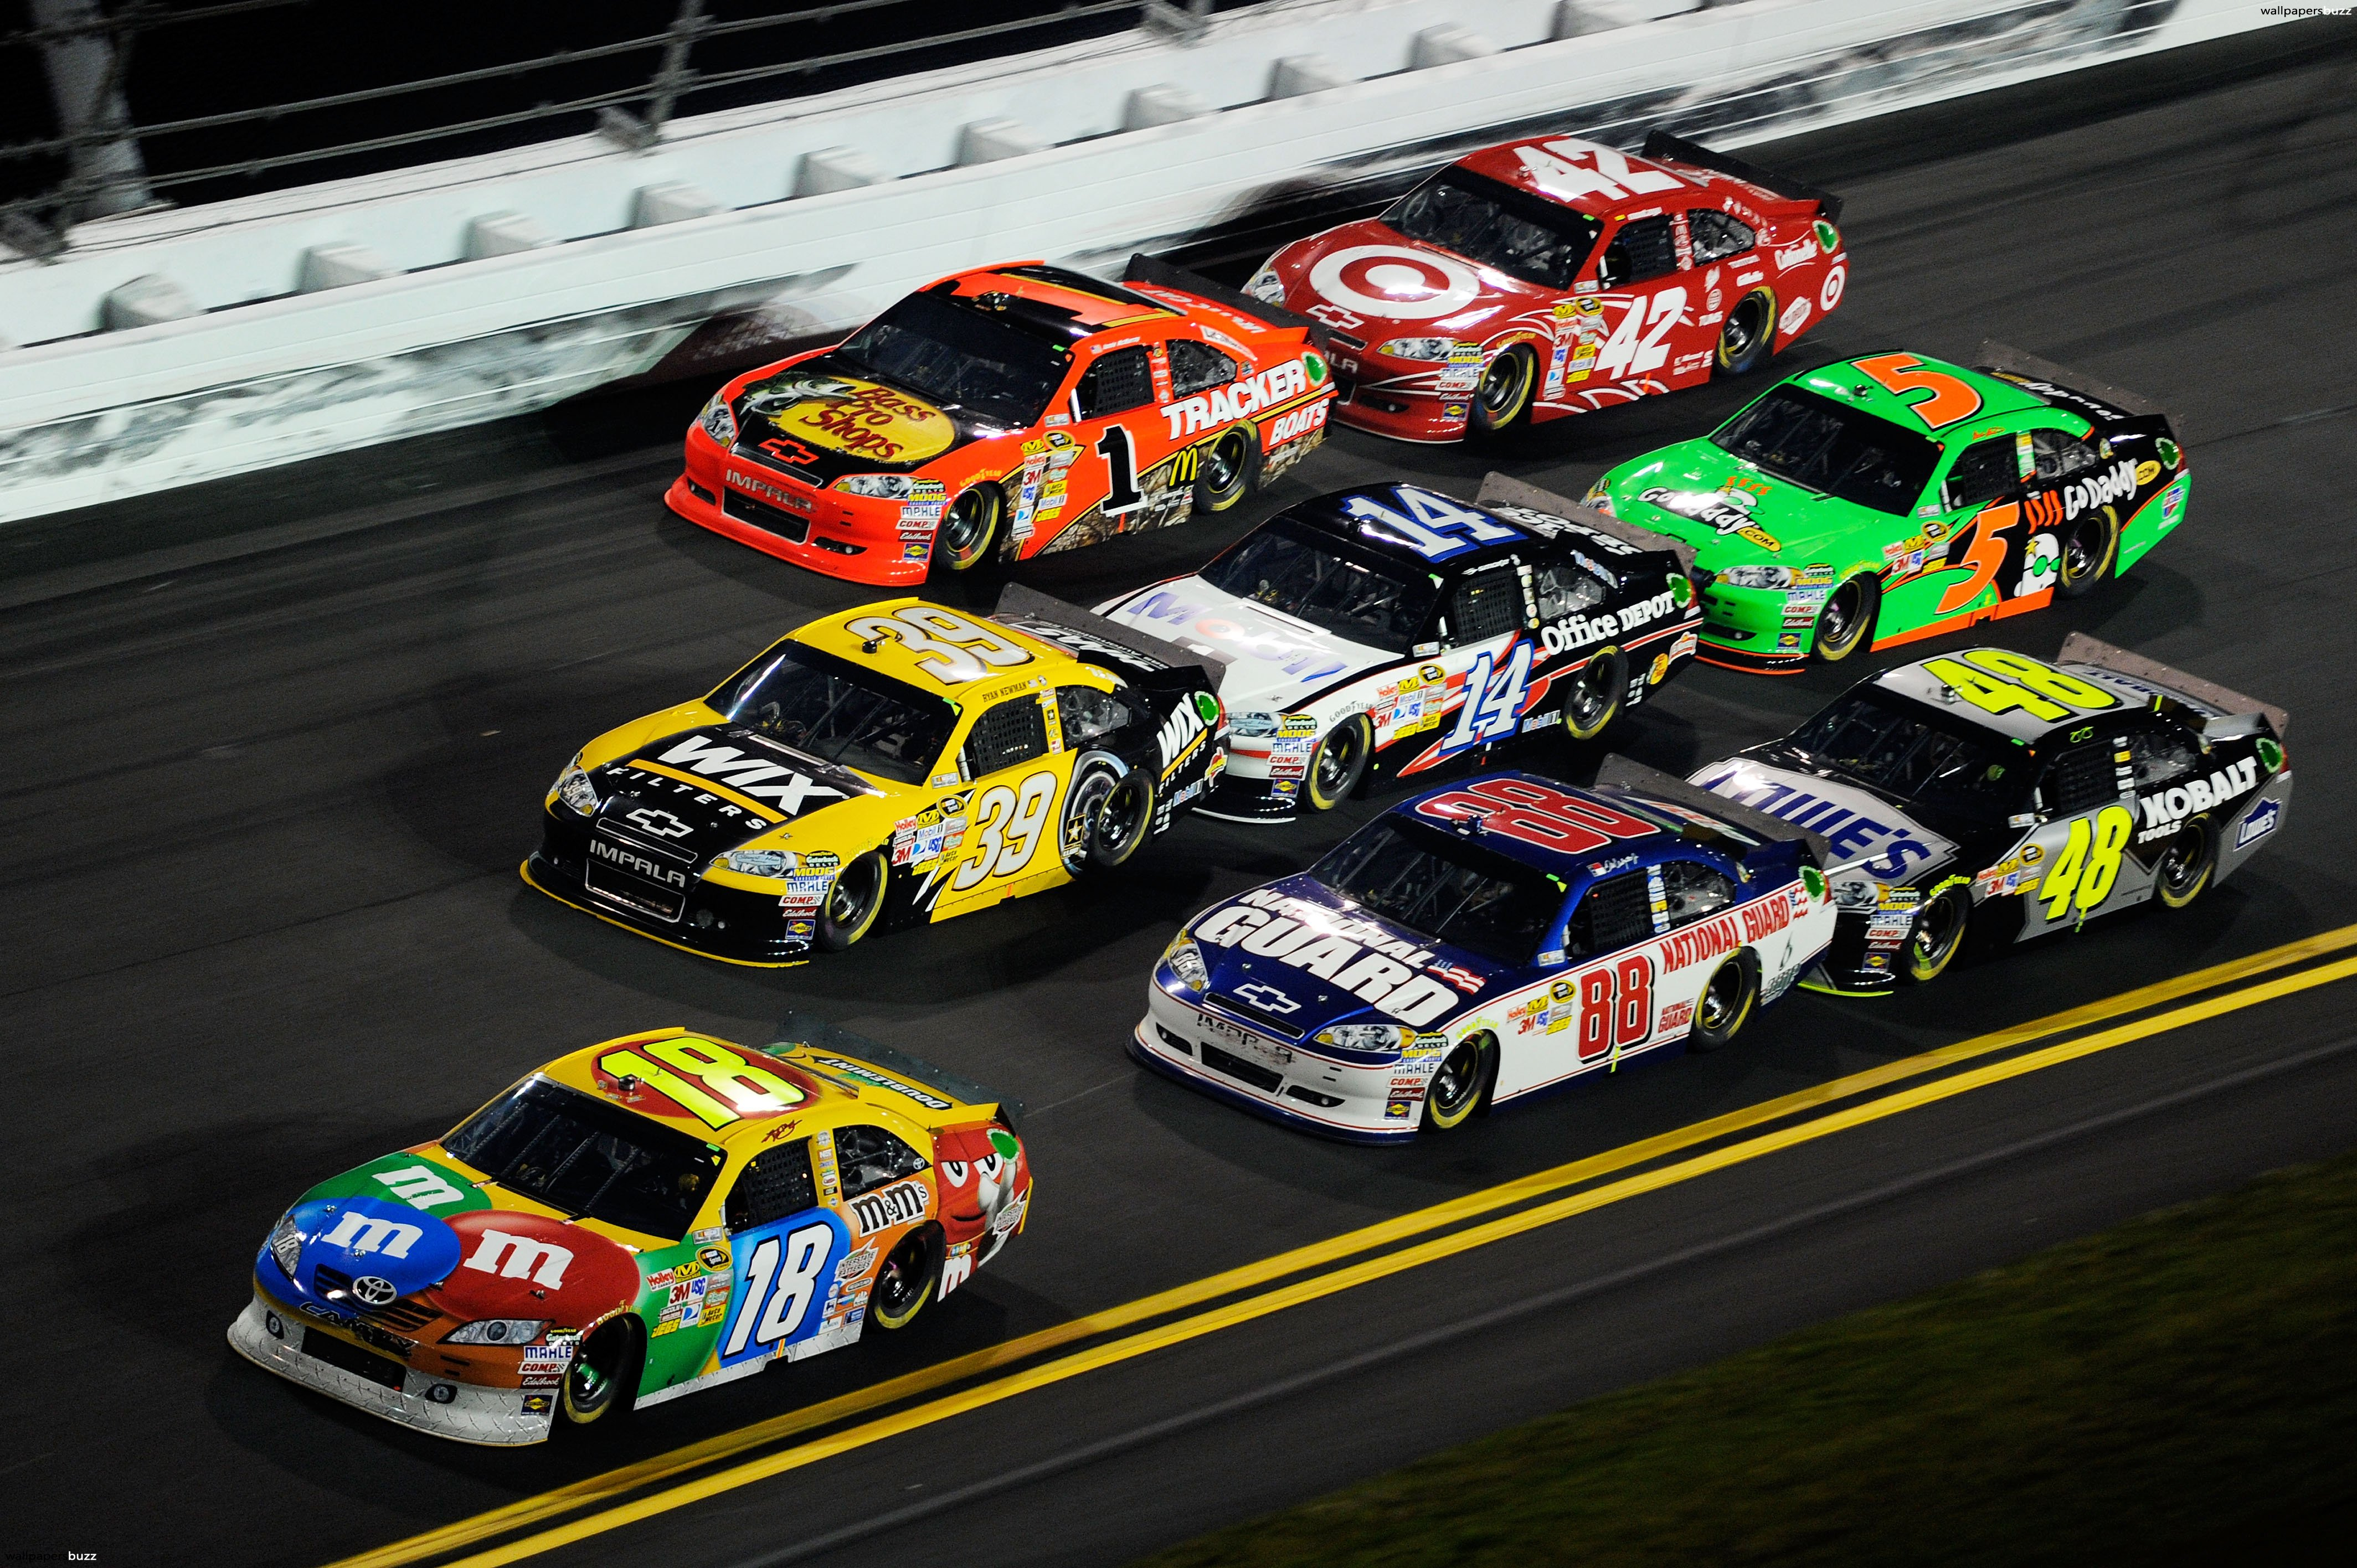 Hd Nascar Backrounds: [49+] NASCAR HD Wallpaper On WallpaperSafari